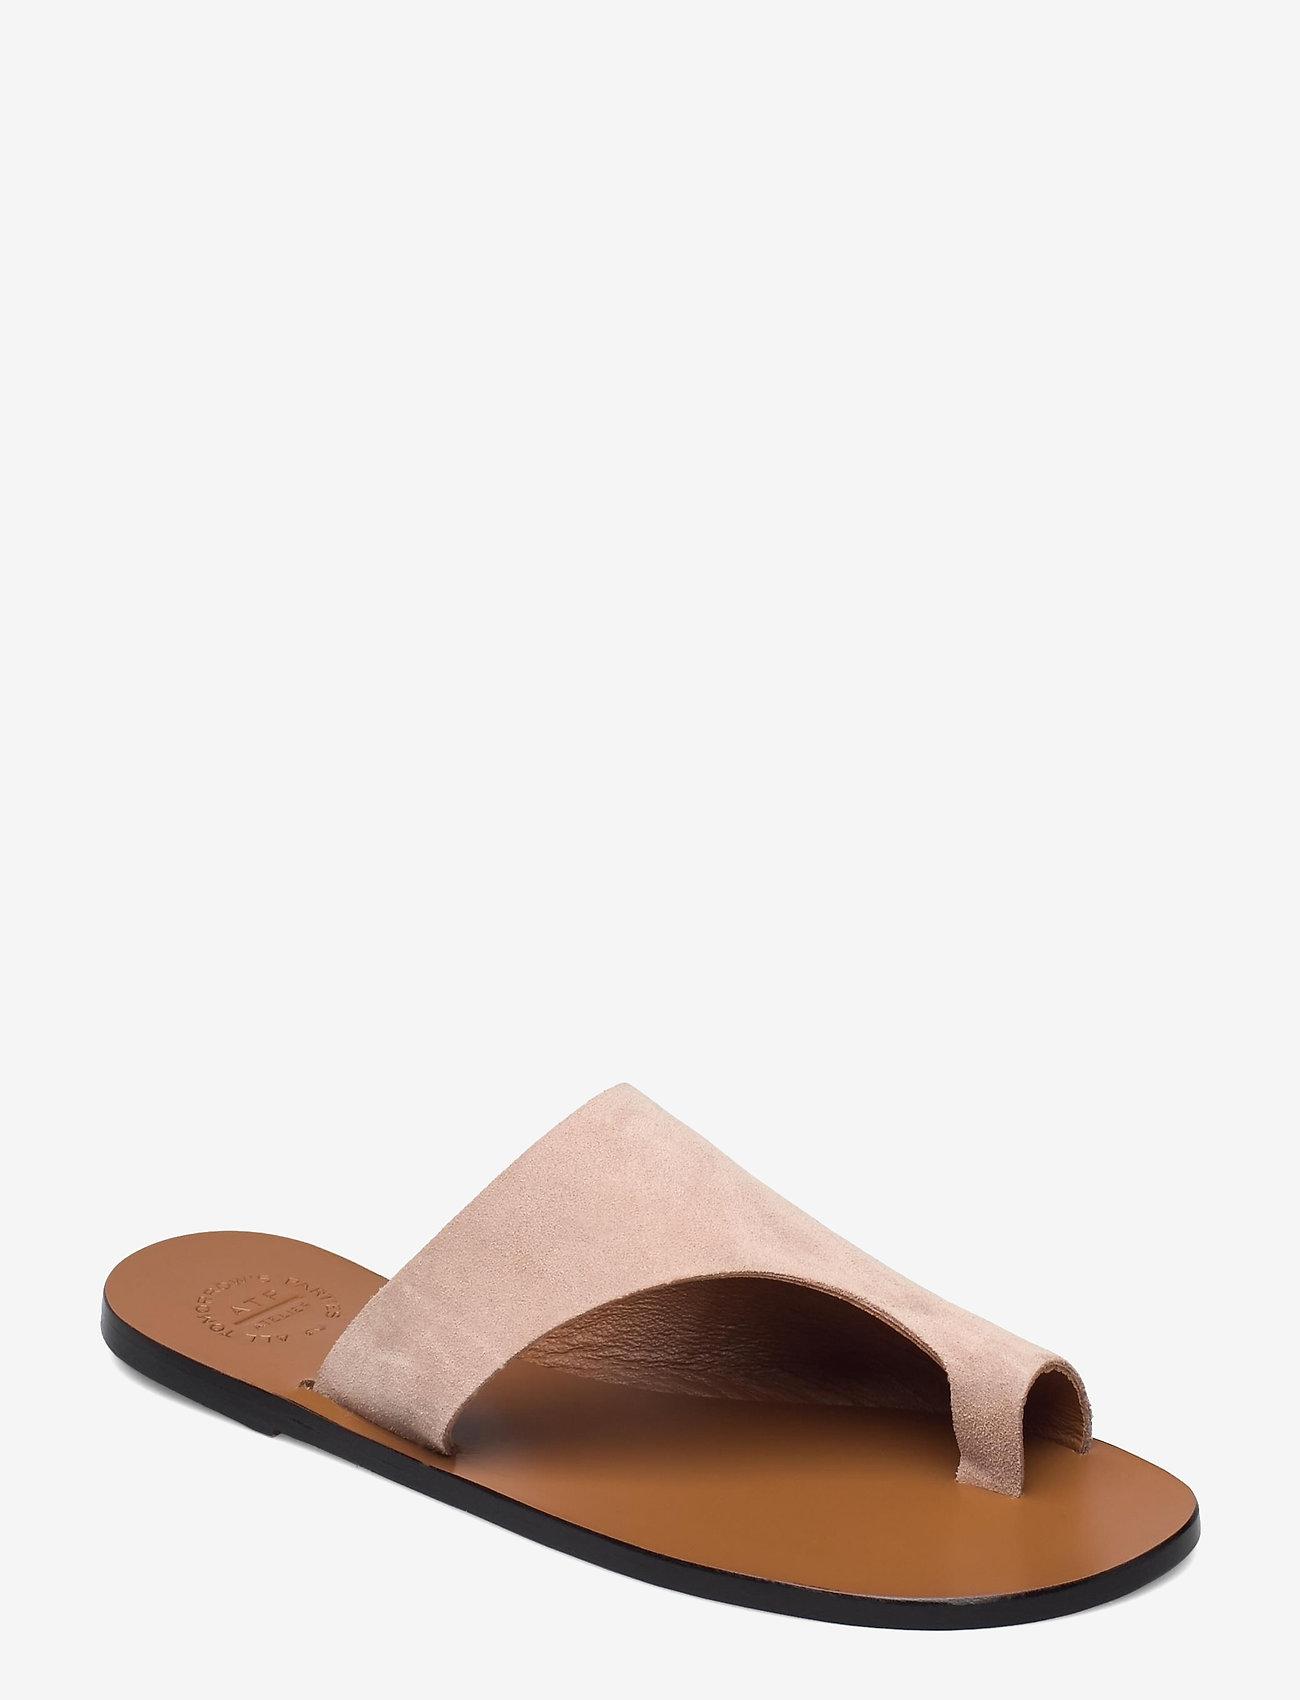 ATP Atelier - Rosa Sand Suede - platta sandaler - sand - 0